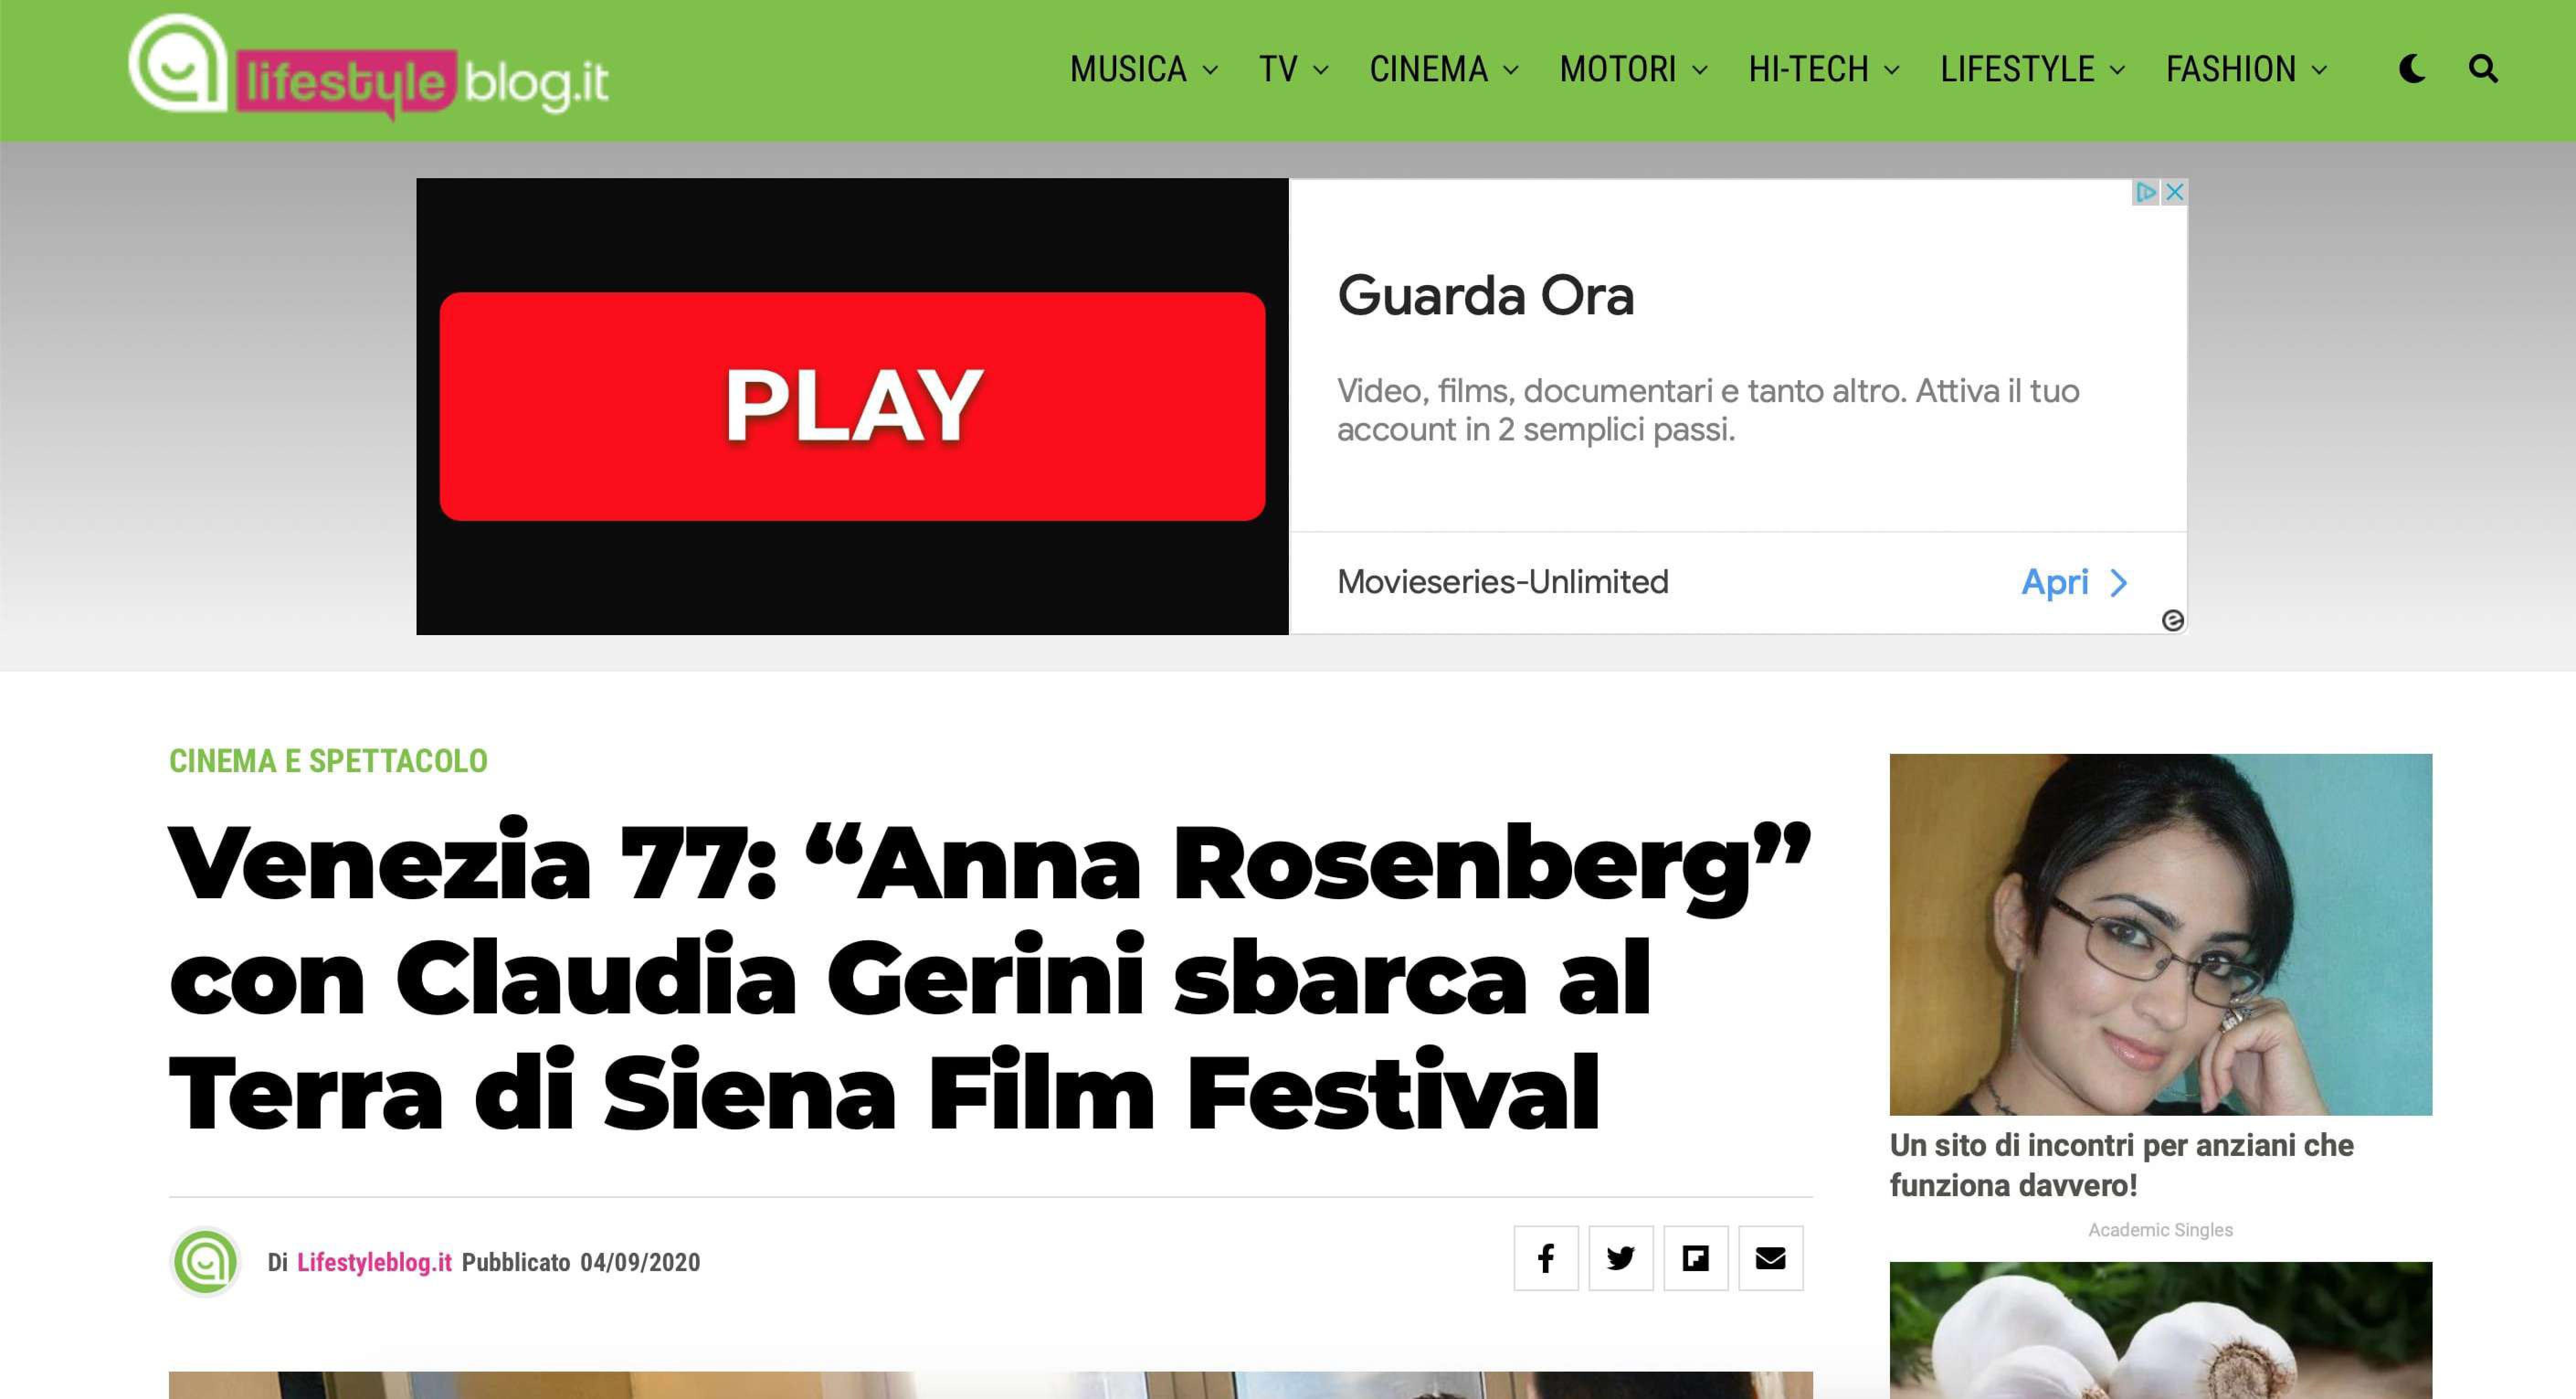 Rassegna Stampa213